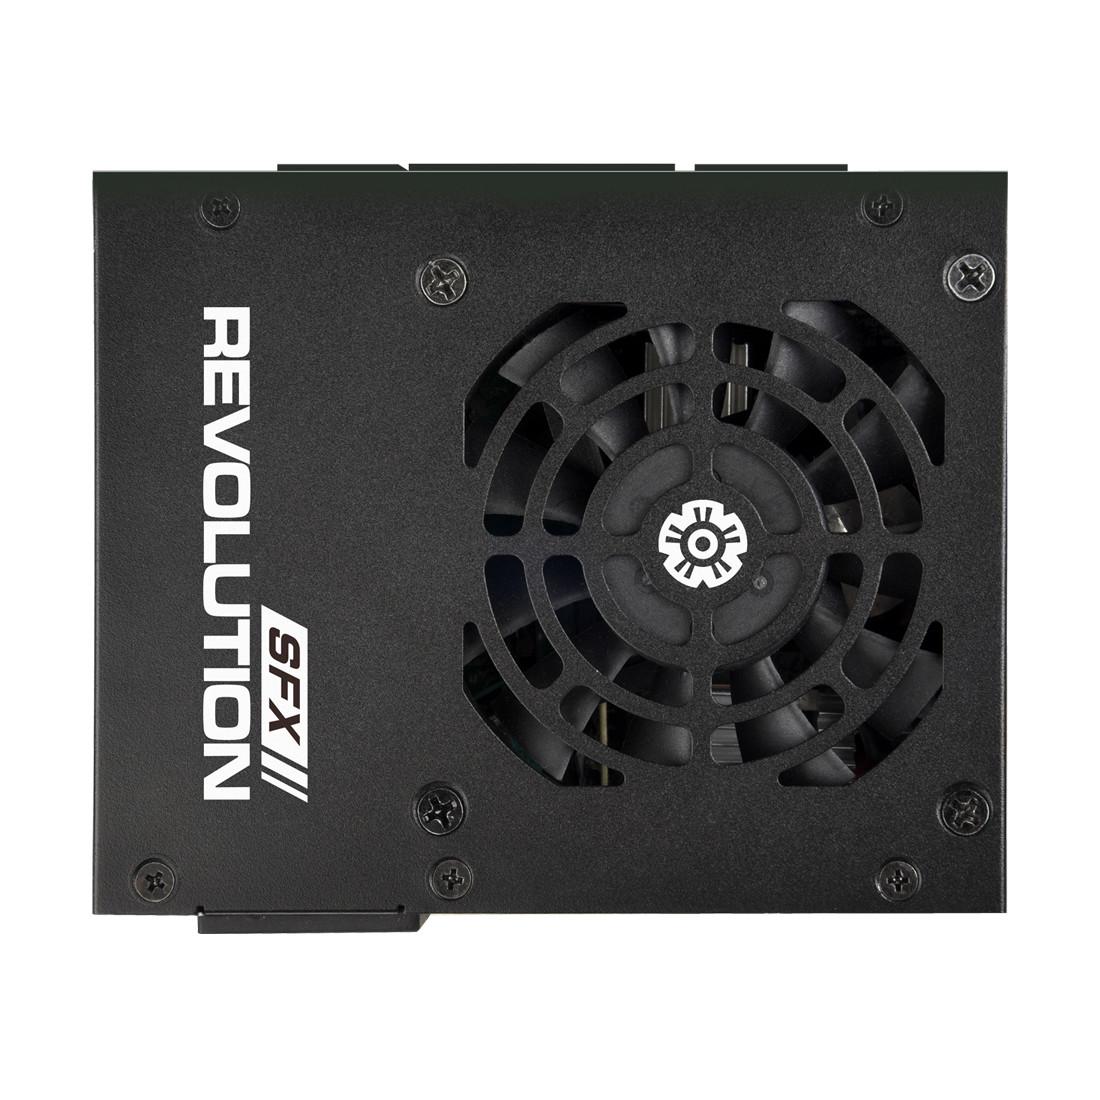 Enernam Revolution SFX series